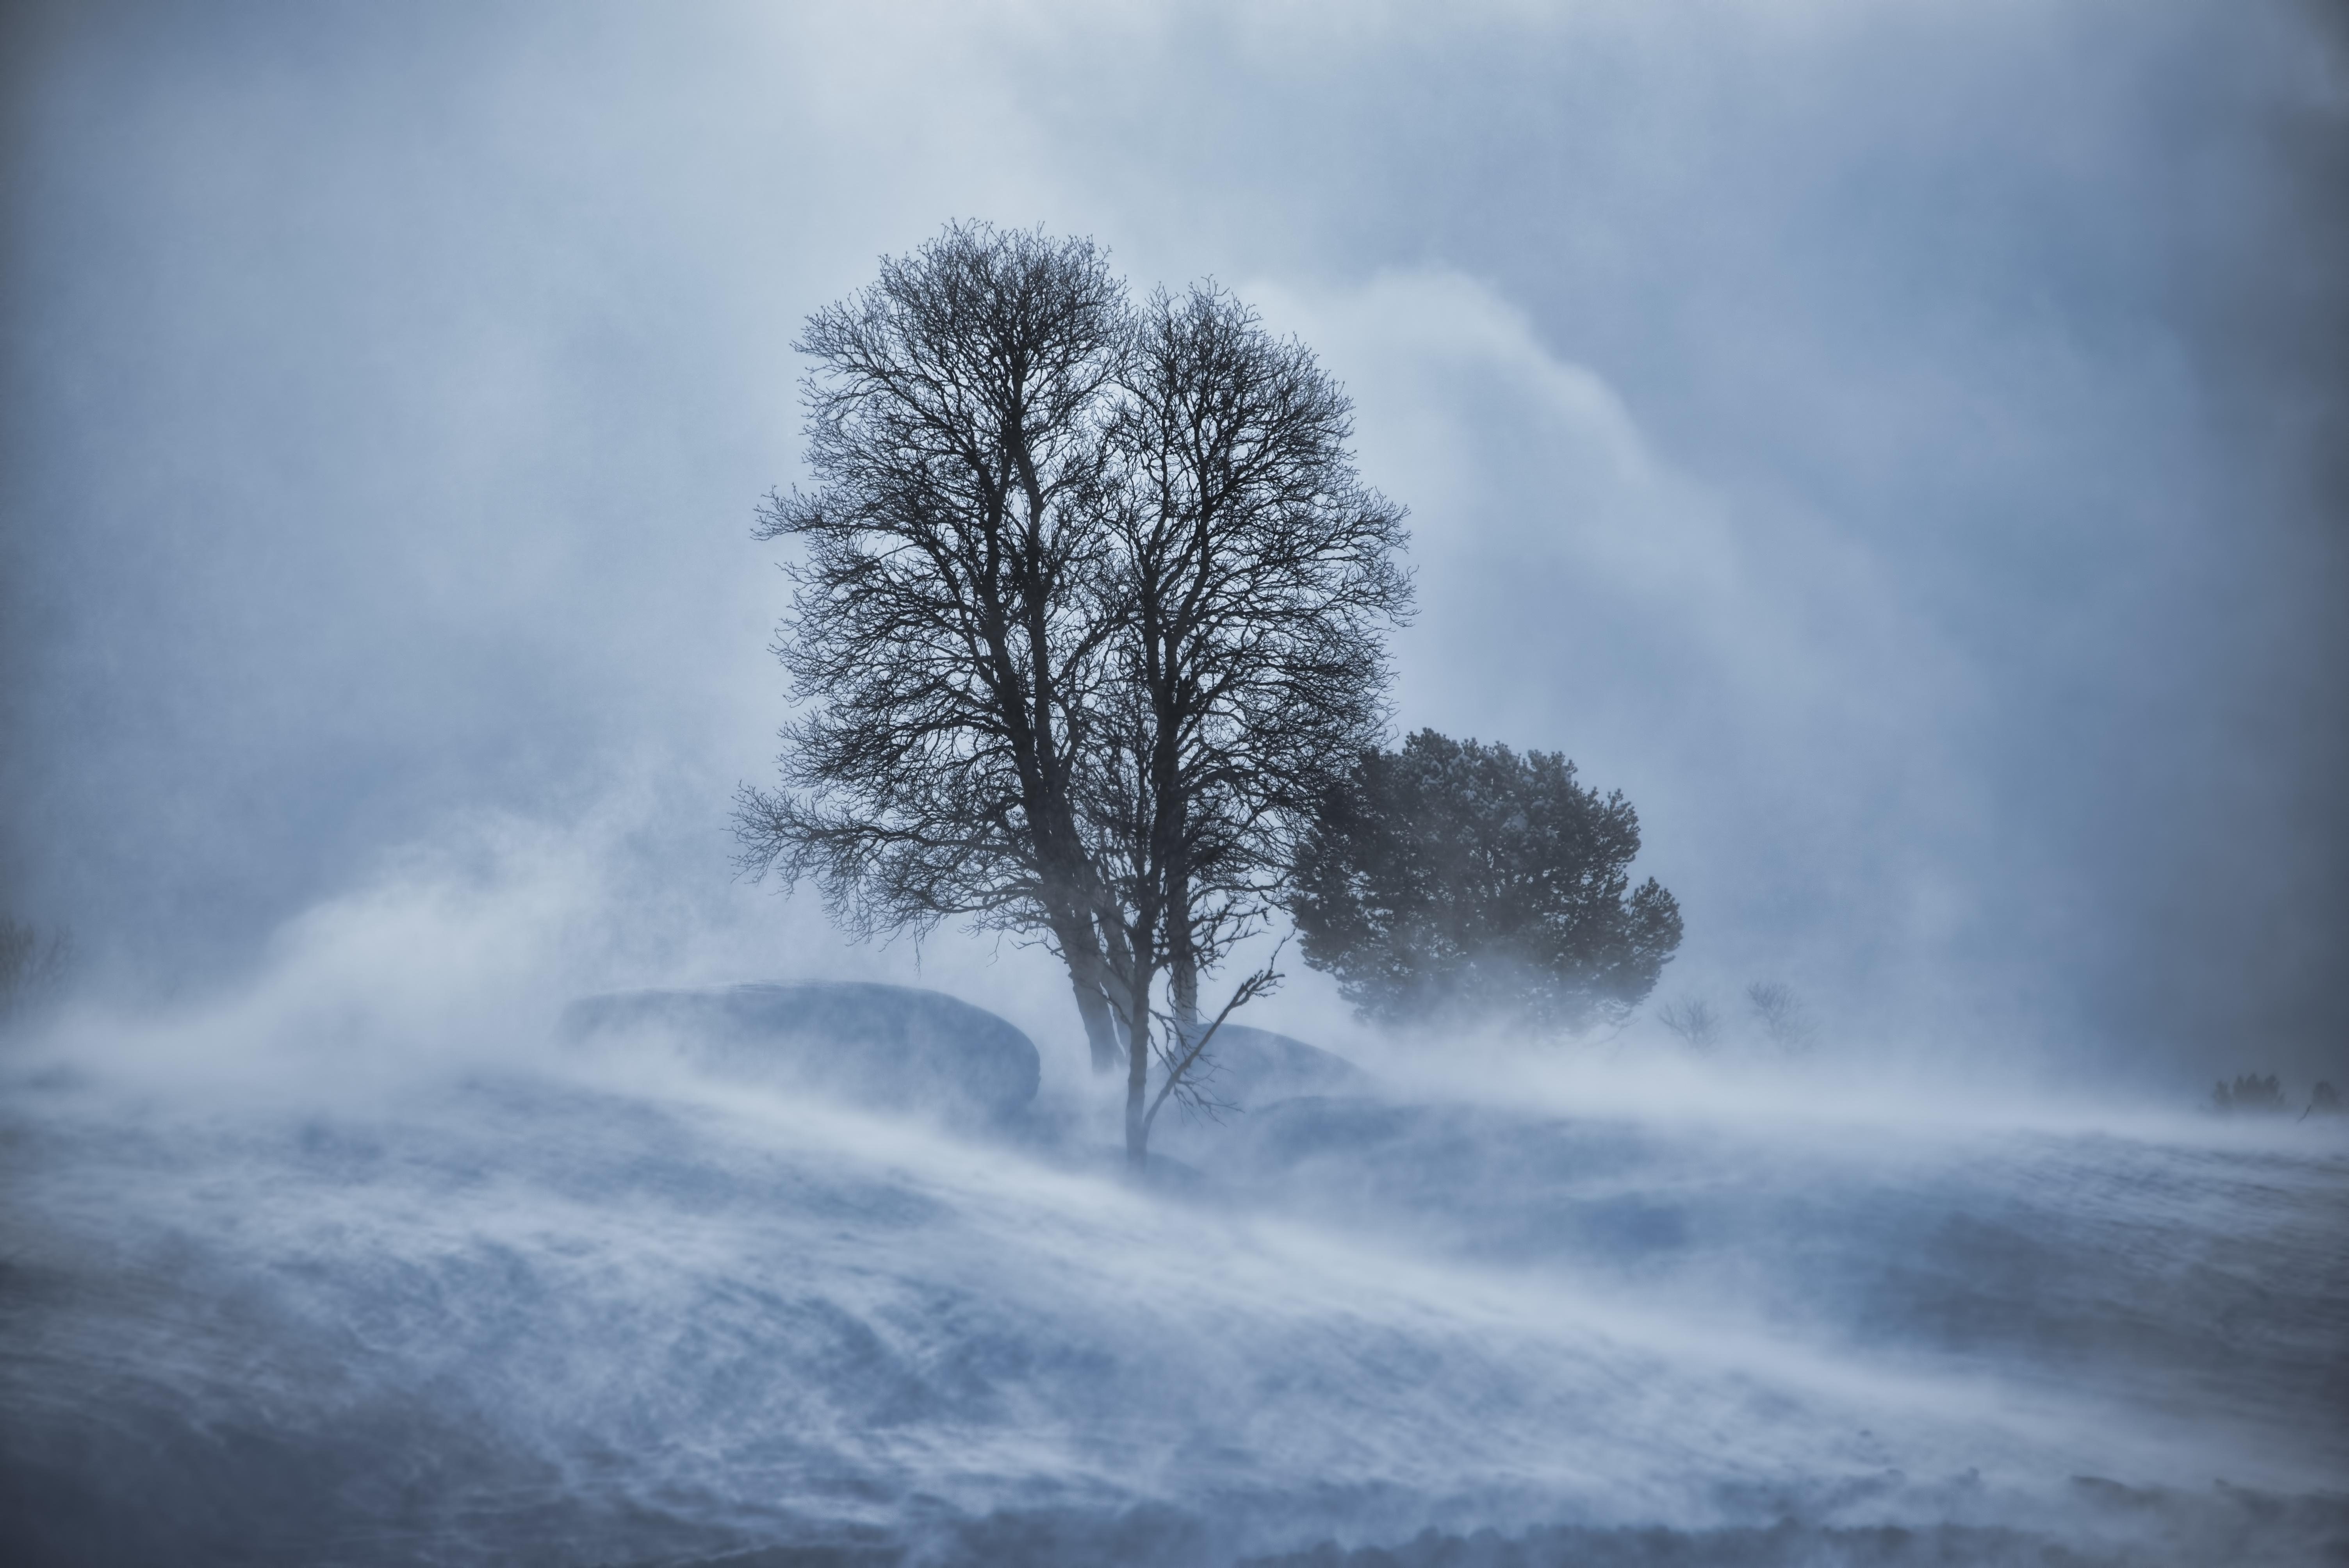 Tree in snow blizzard